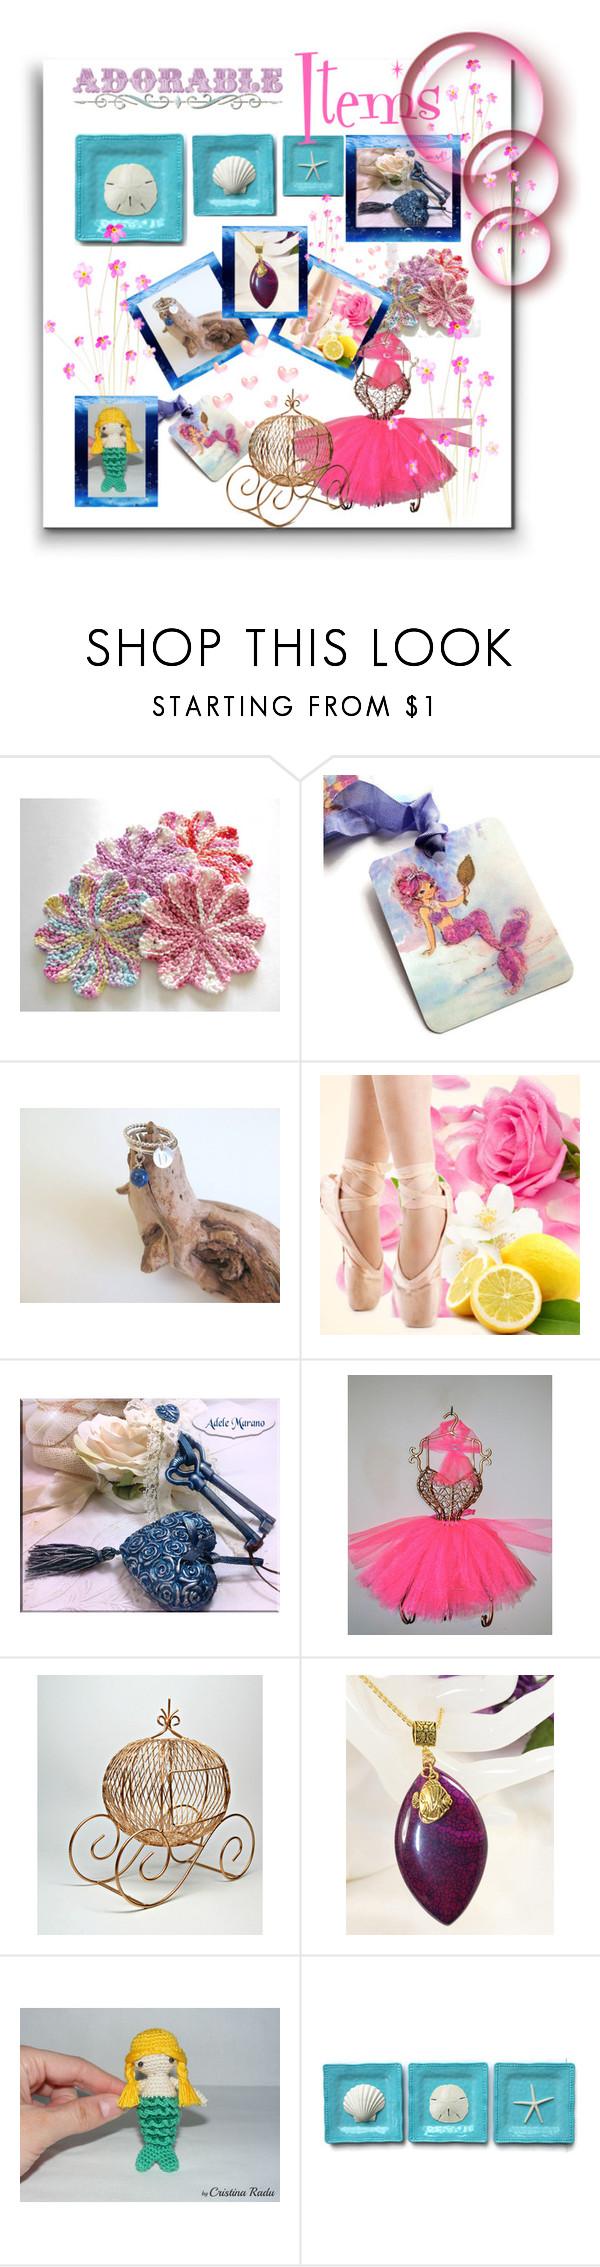 """Adorable Etsy items around the world !"" by adelemarano on Polyvore featuring interior, interiors, interior design, Casa, home decor, interior decorating e B. Ella"